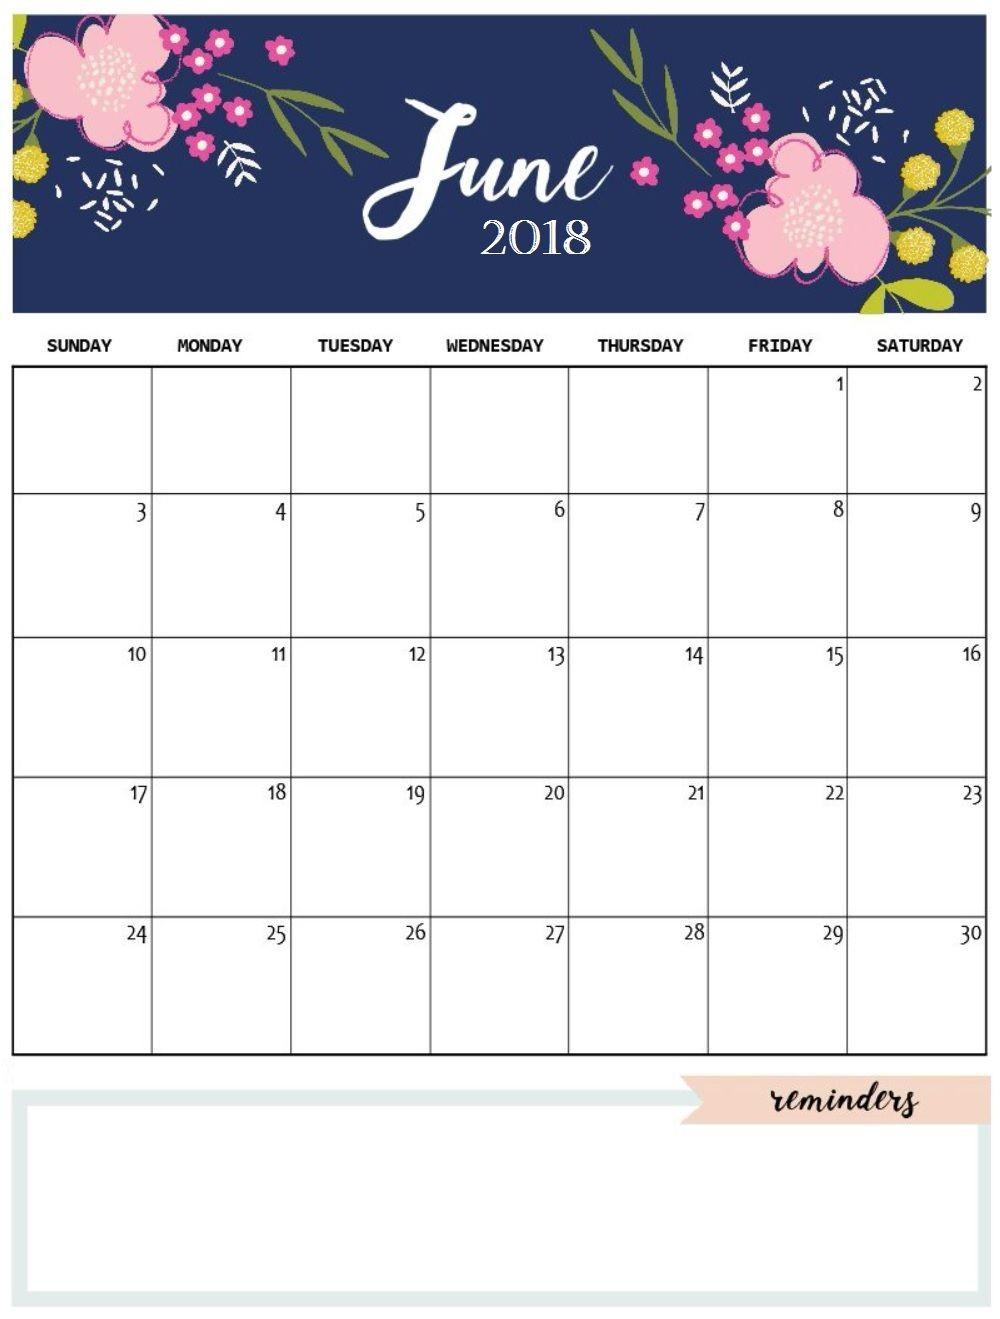 Cute June 2018 Calendar Template calendars